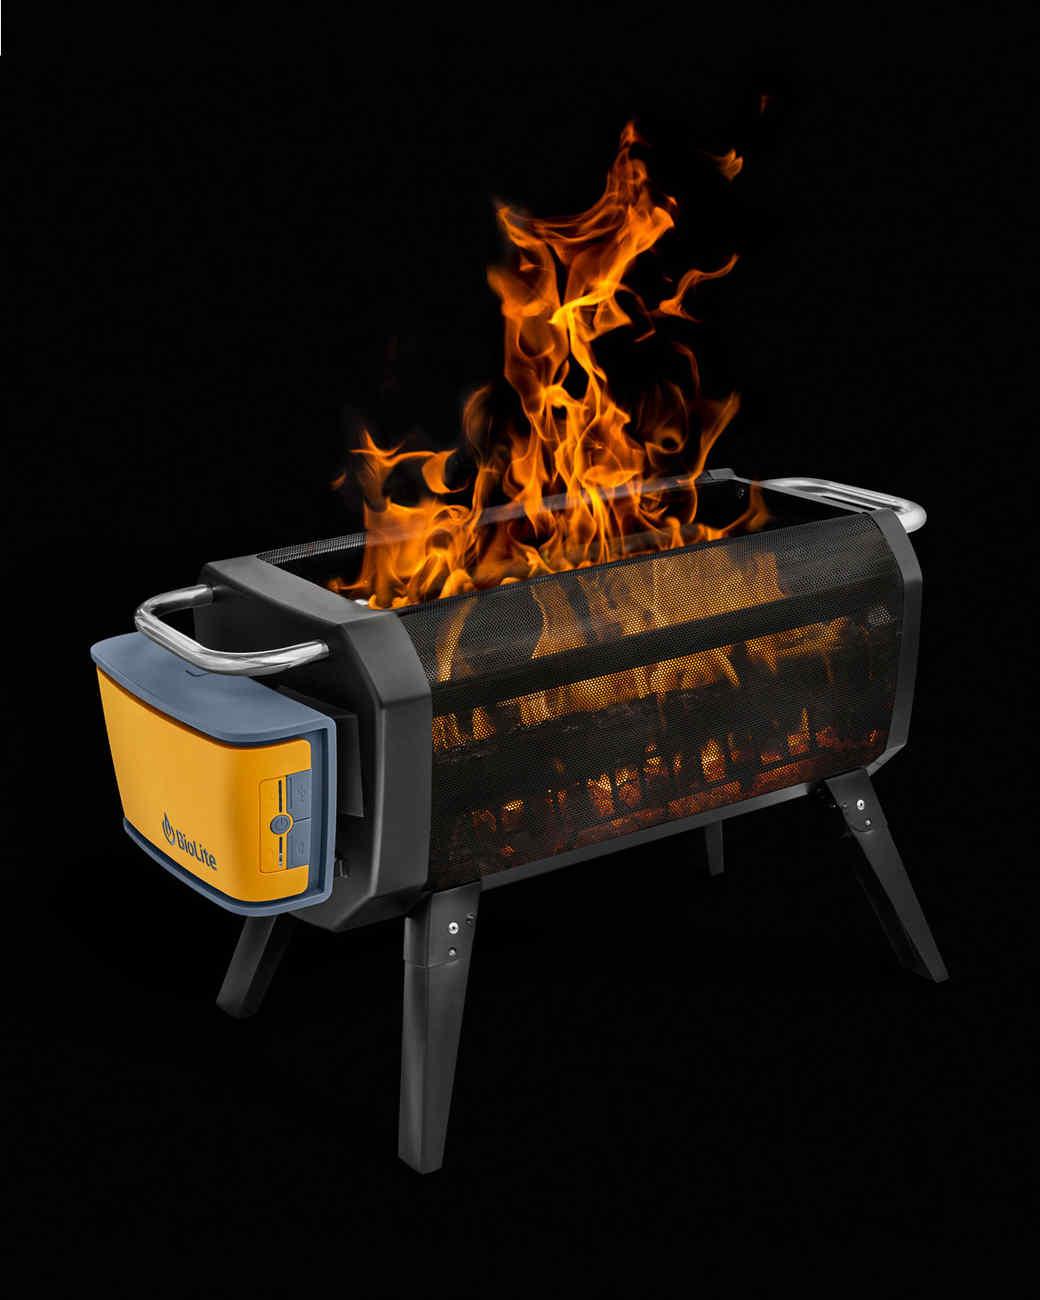 biolight firepit